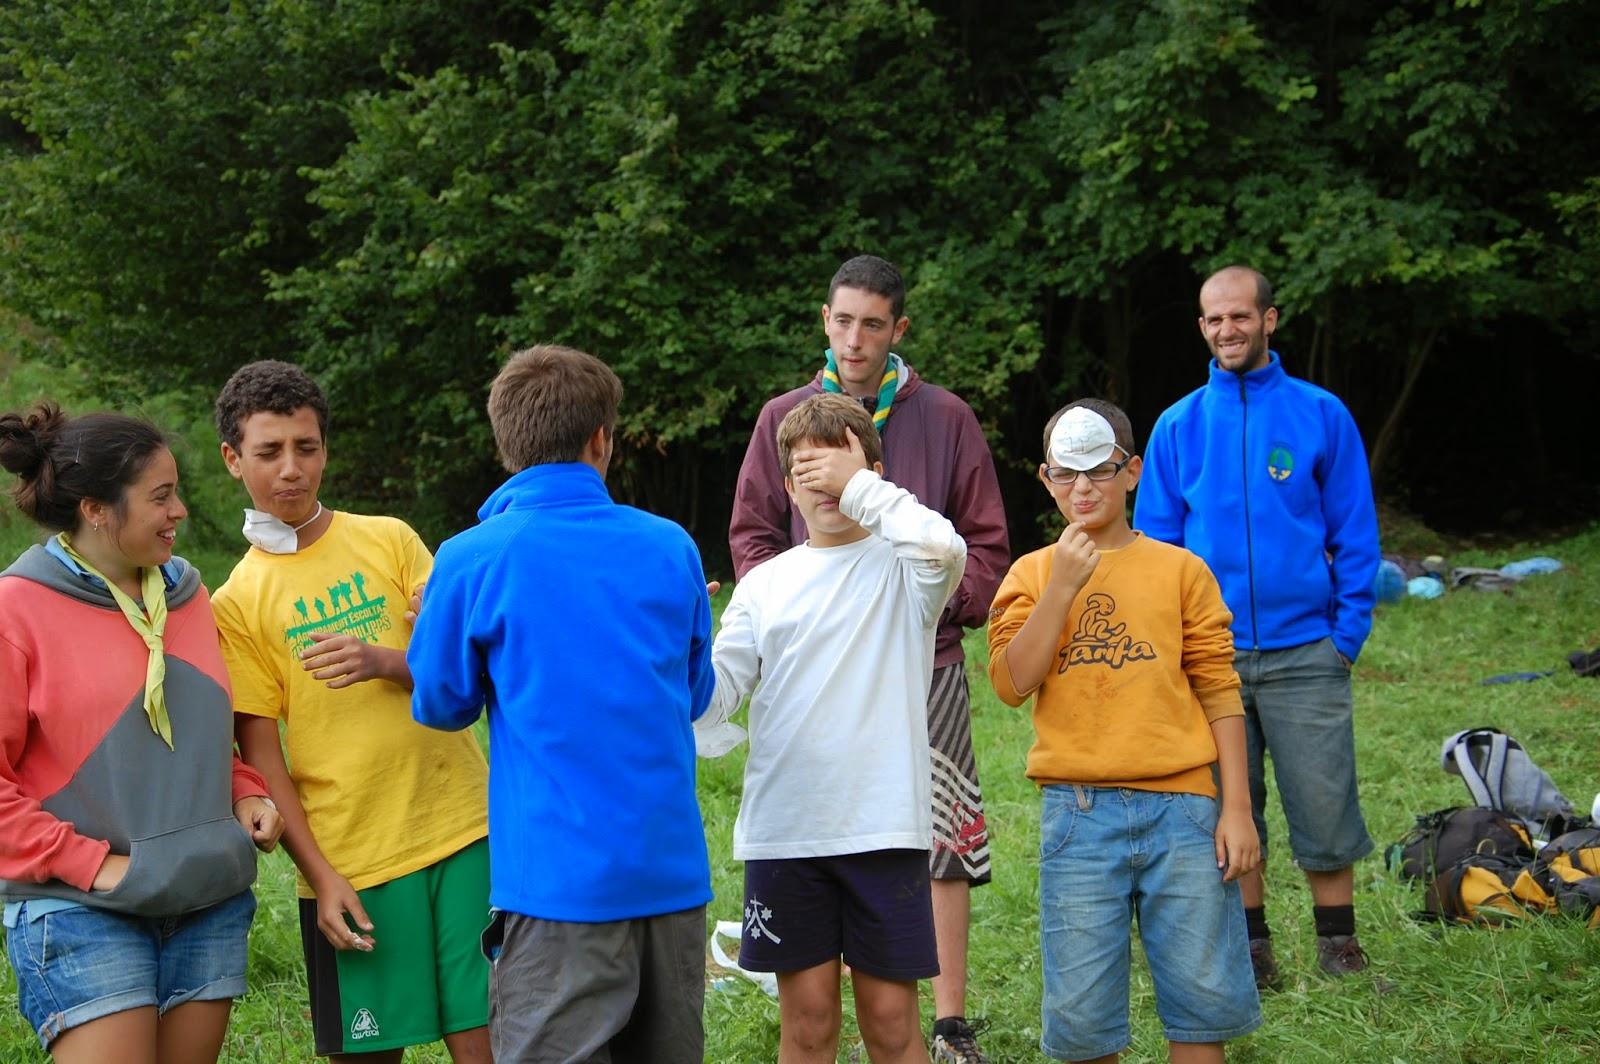 Campaments Estiu RolandKing 2011 - DSC_0225.JPG